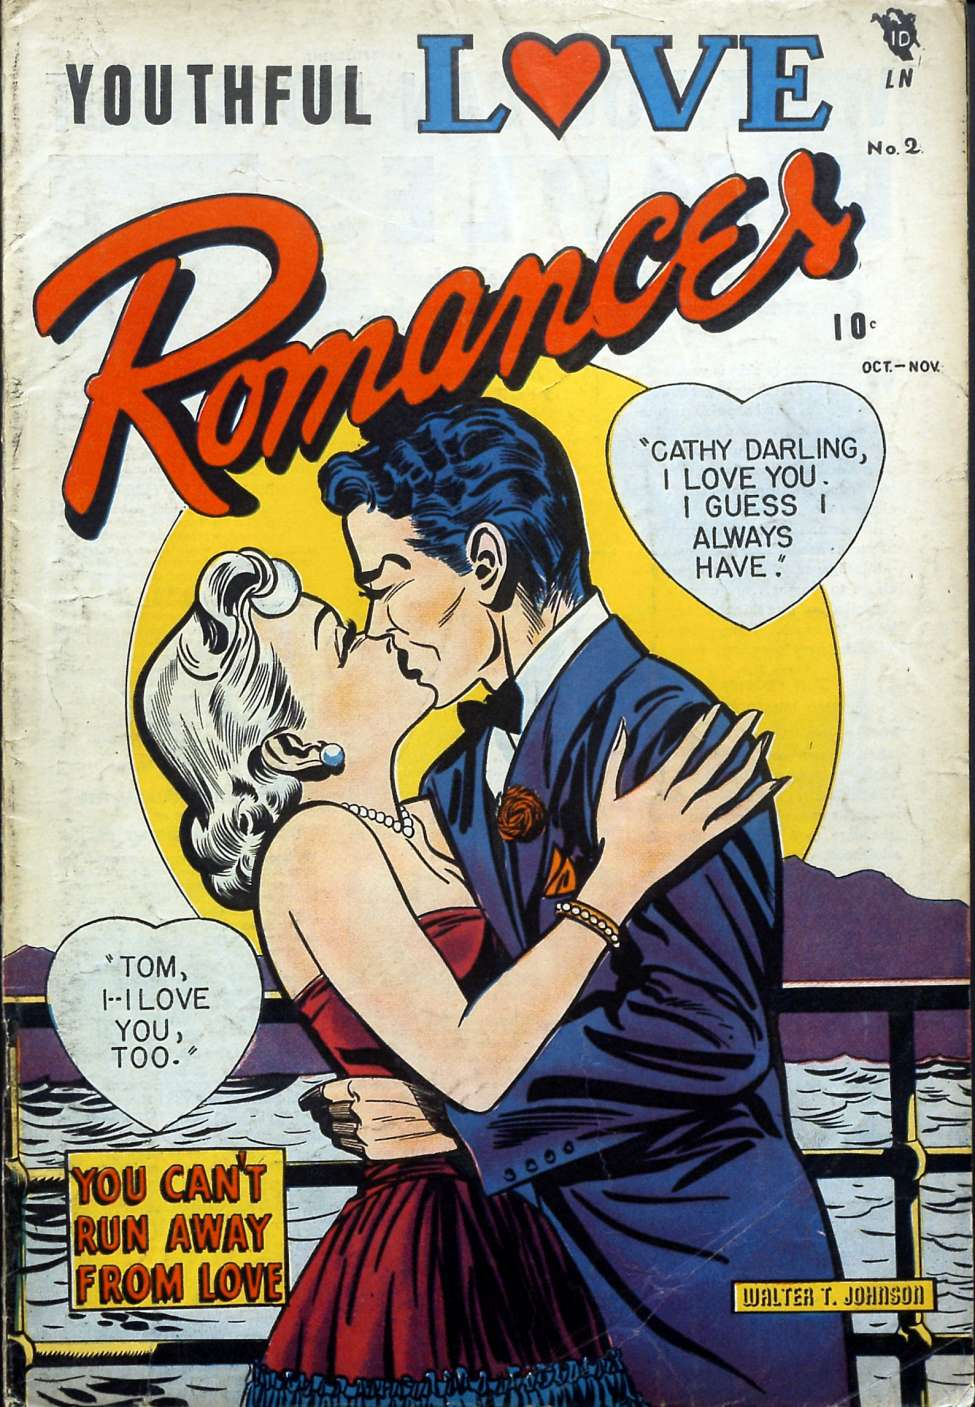 Youthful Love Romances #2, Youthful Magazines